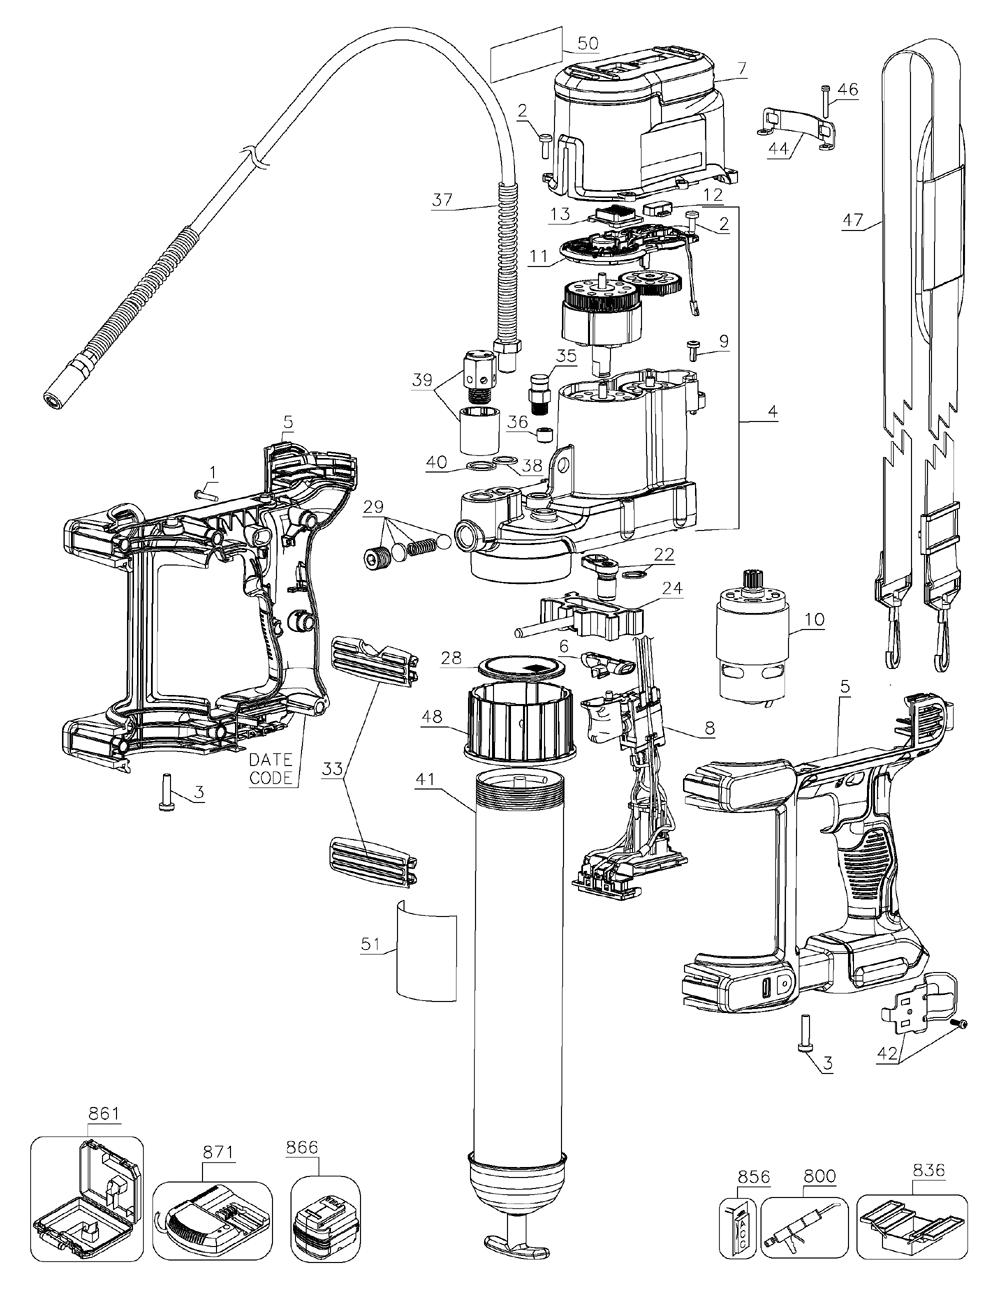 Lincoln Grease Gun Parts Diagram Schematic Diagrams Quick Lube Wiring Trusted U2022 144 Volt Breakdown